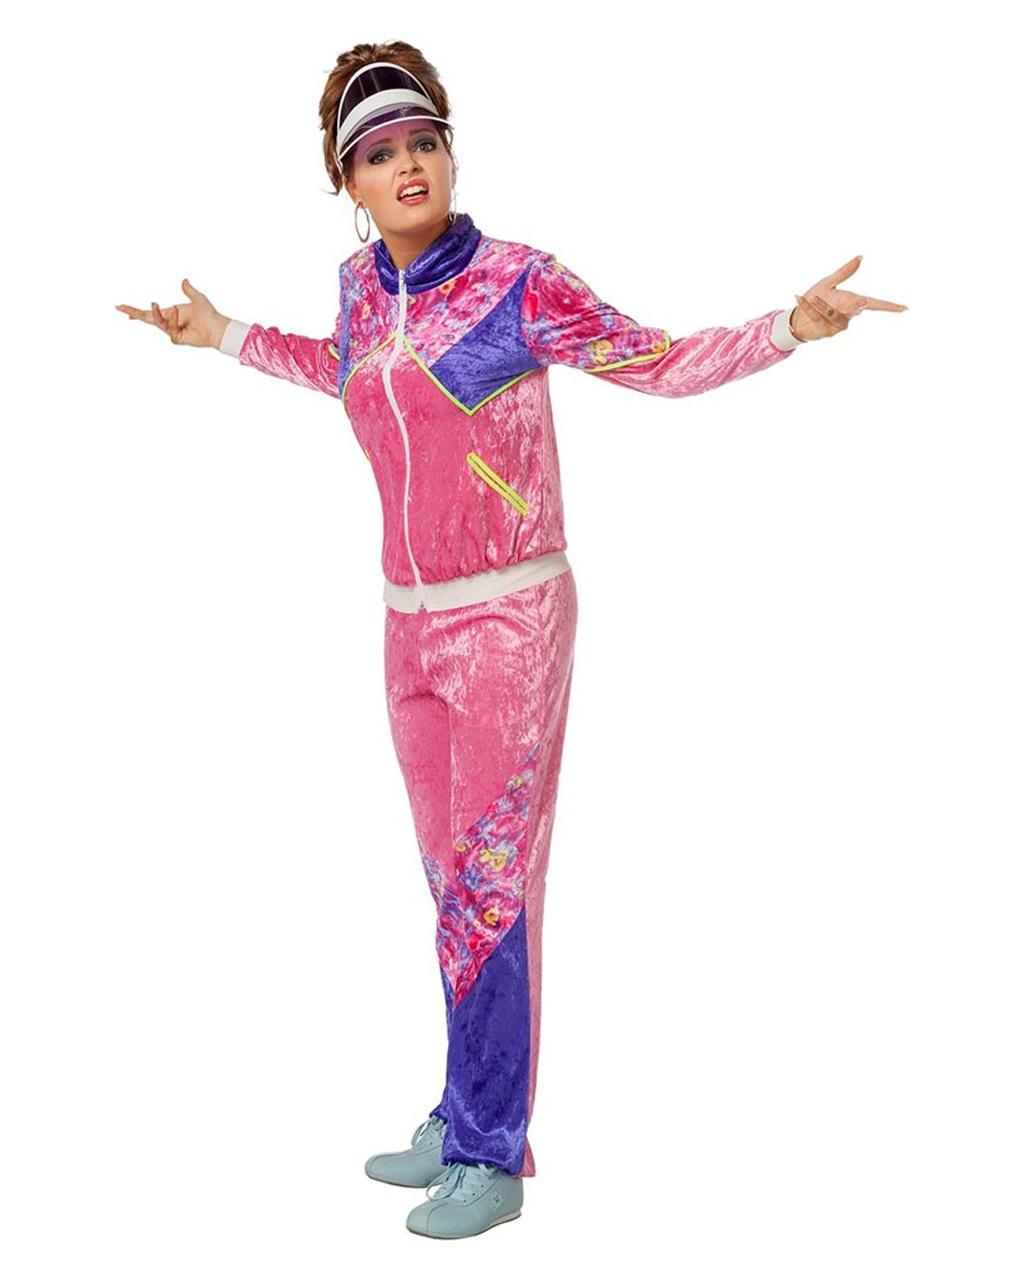 80er Damen Kostum Trainingsanzug Als 80s Kostum Karneval Universe